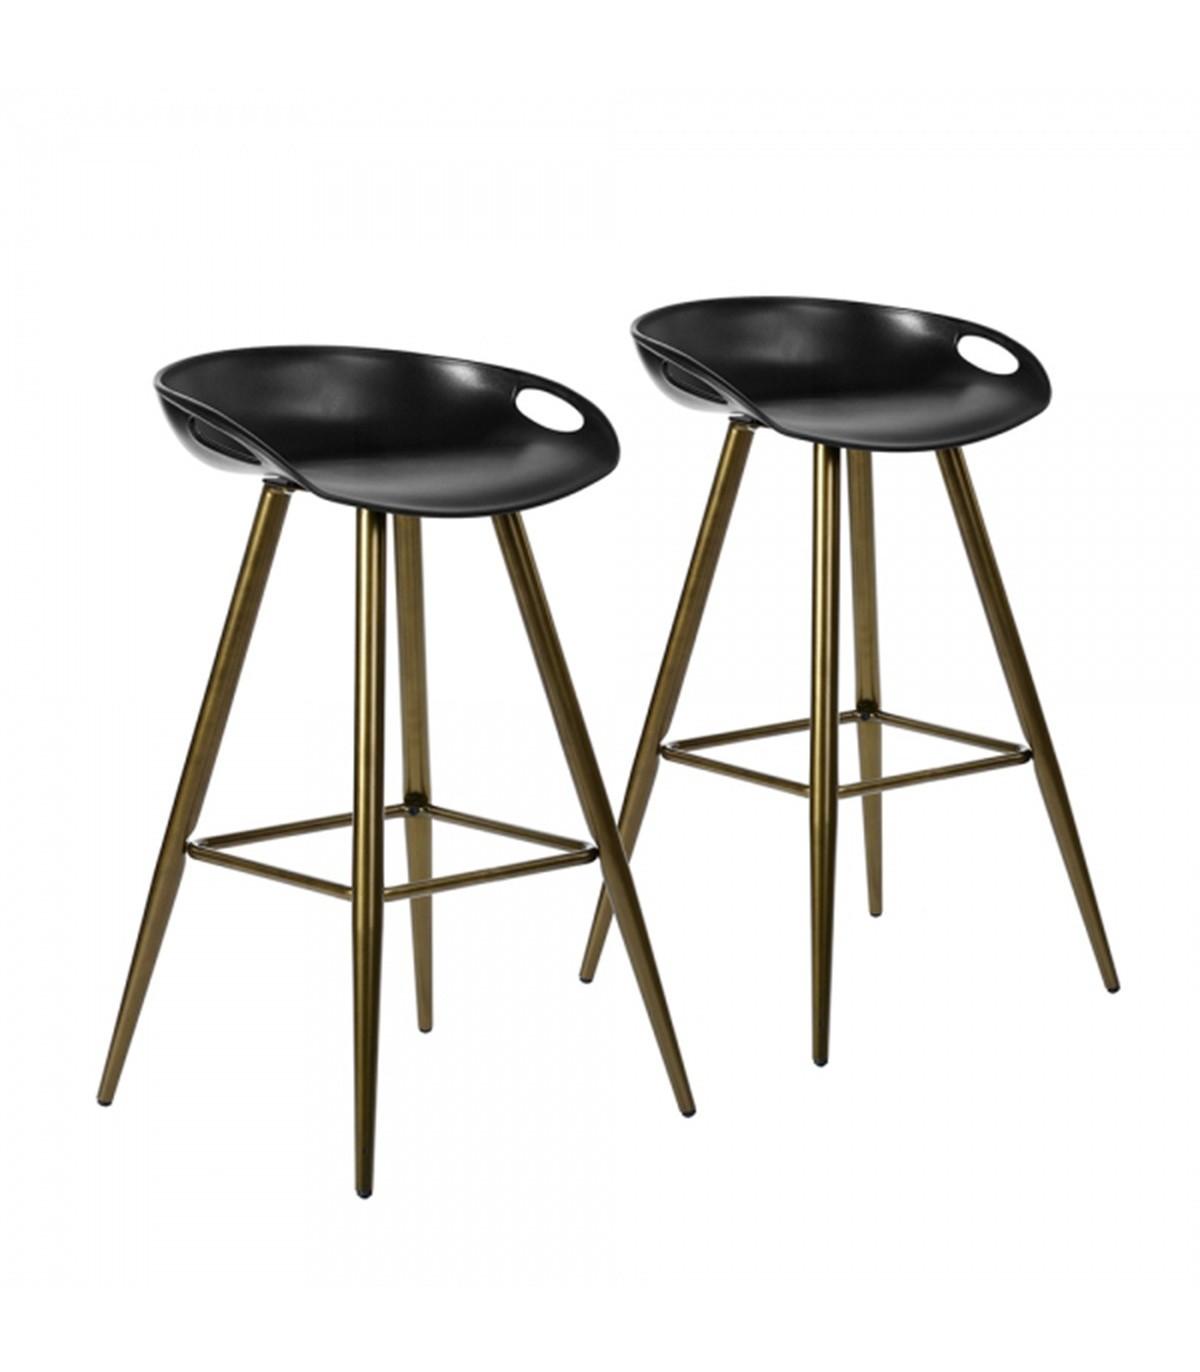 Tabouret de bar Industriel / Scandinave noir et bronze - lot de 7